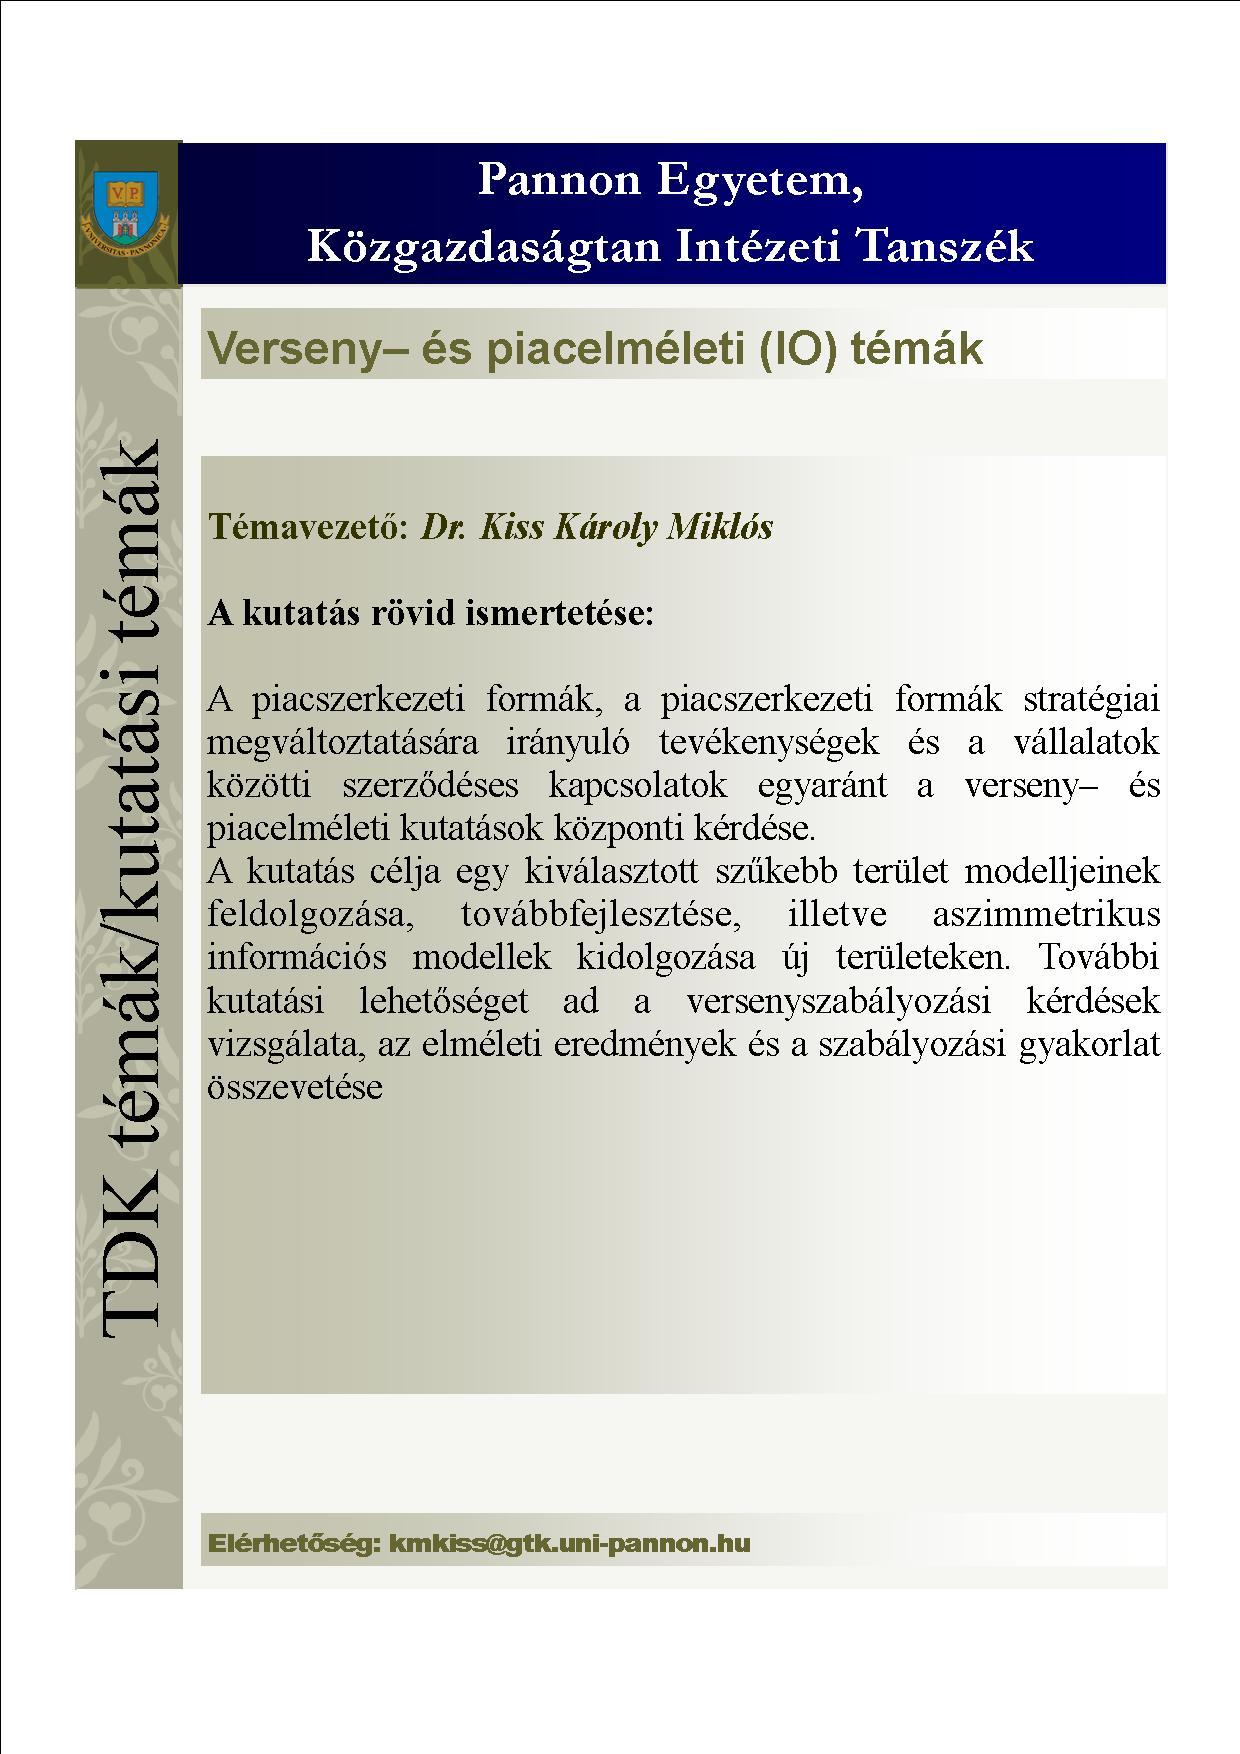 Kiss_Kroly_Mikls_verseny_s_piacelmlet